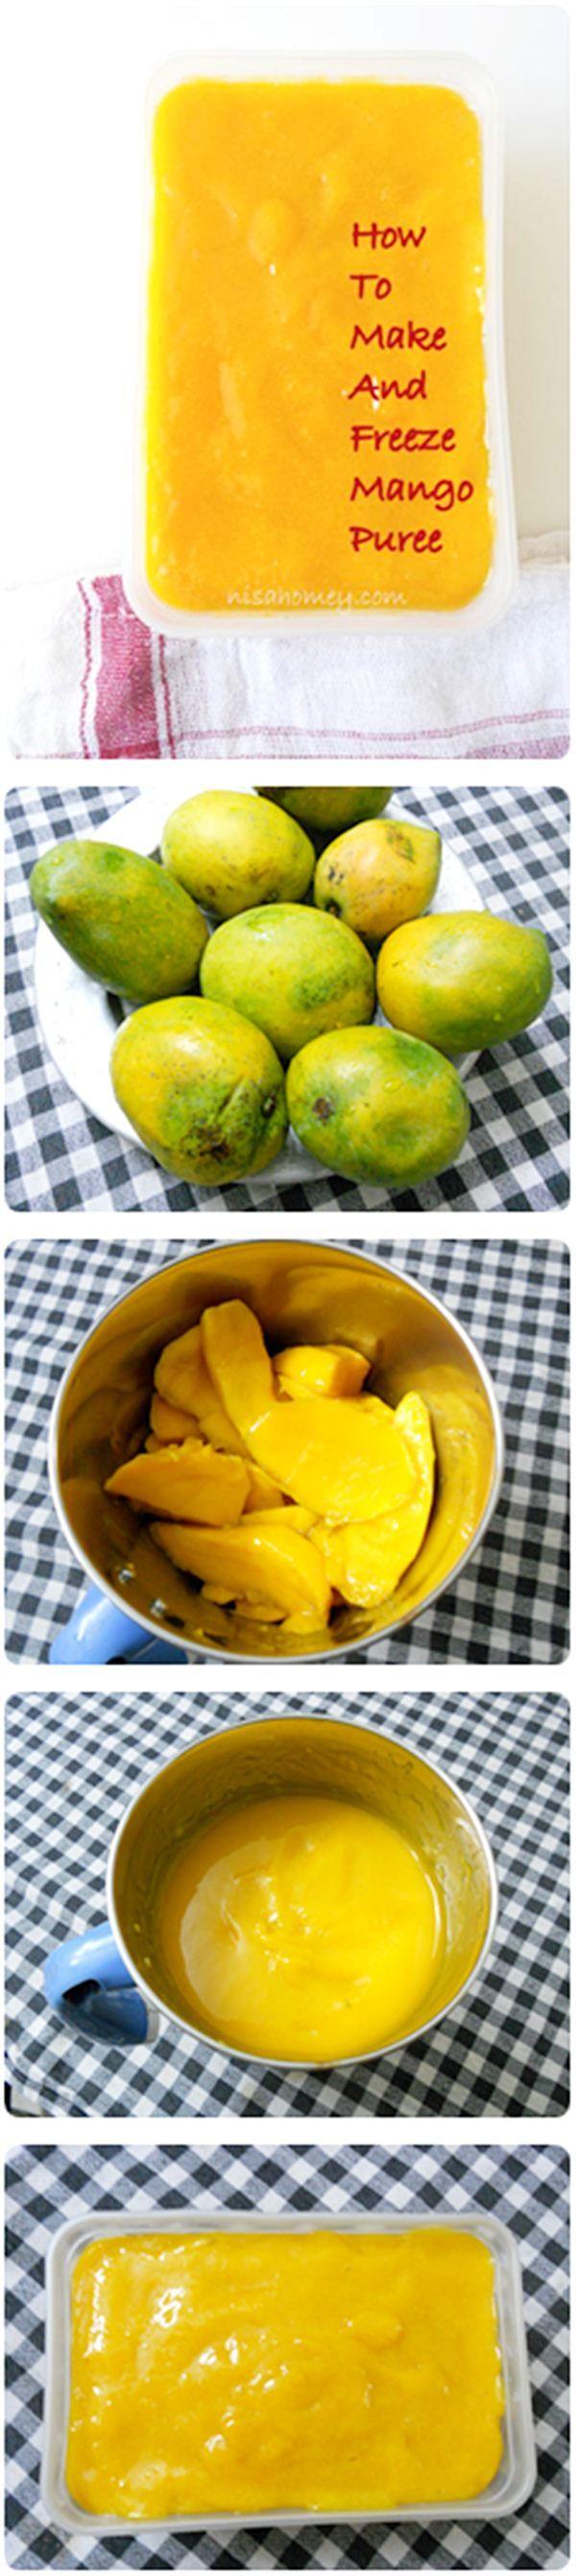 How To Make Mango Puree, Diy Mango Puree Is So Easy To Make